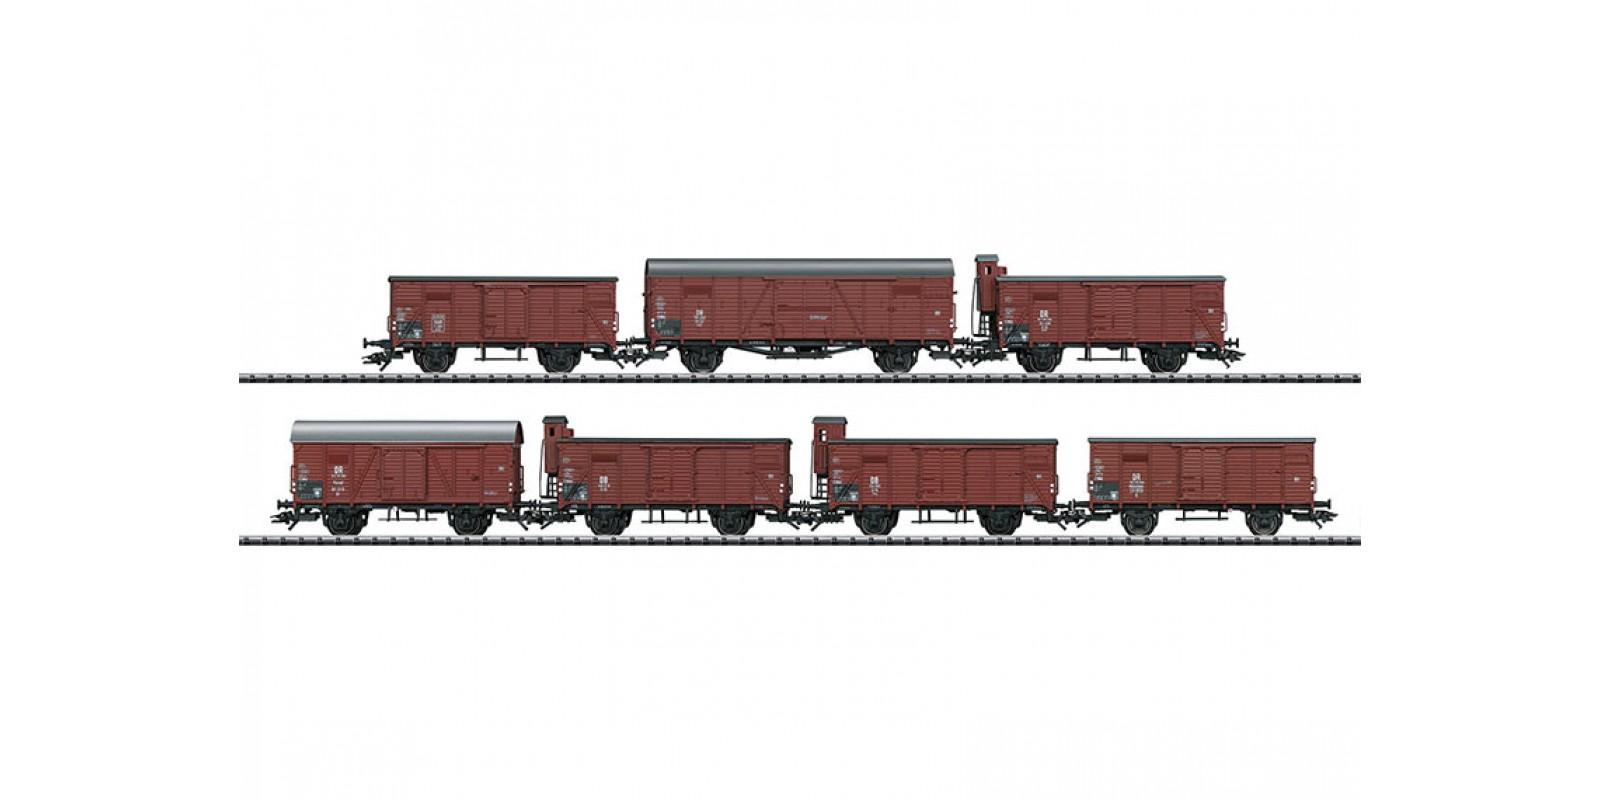 48827 Type G 10 Freight Car Set, INSIDER MODEL 2016